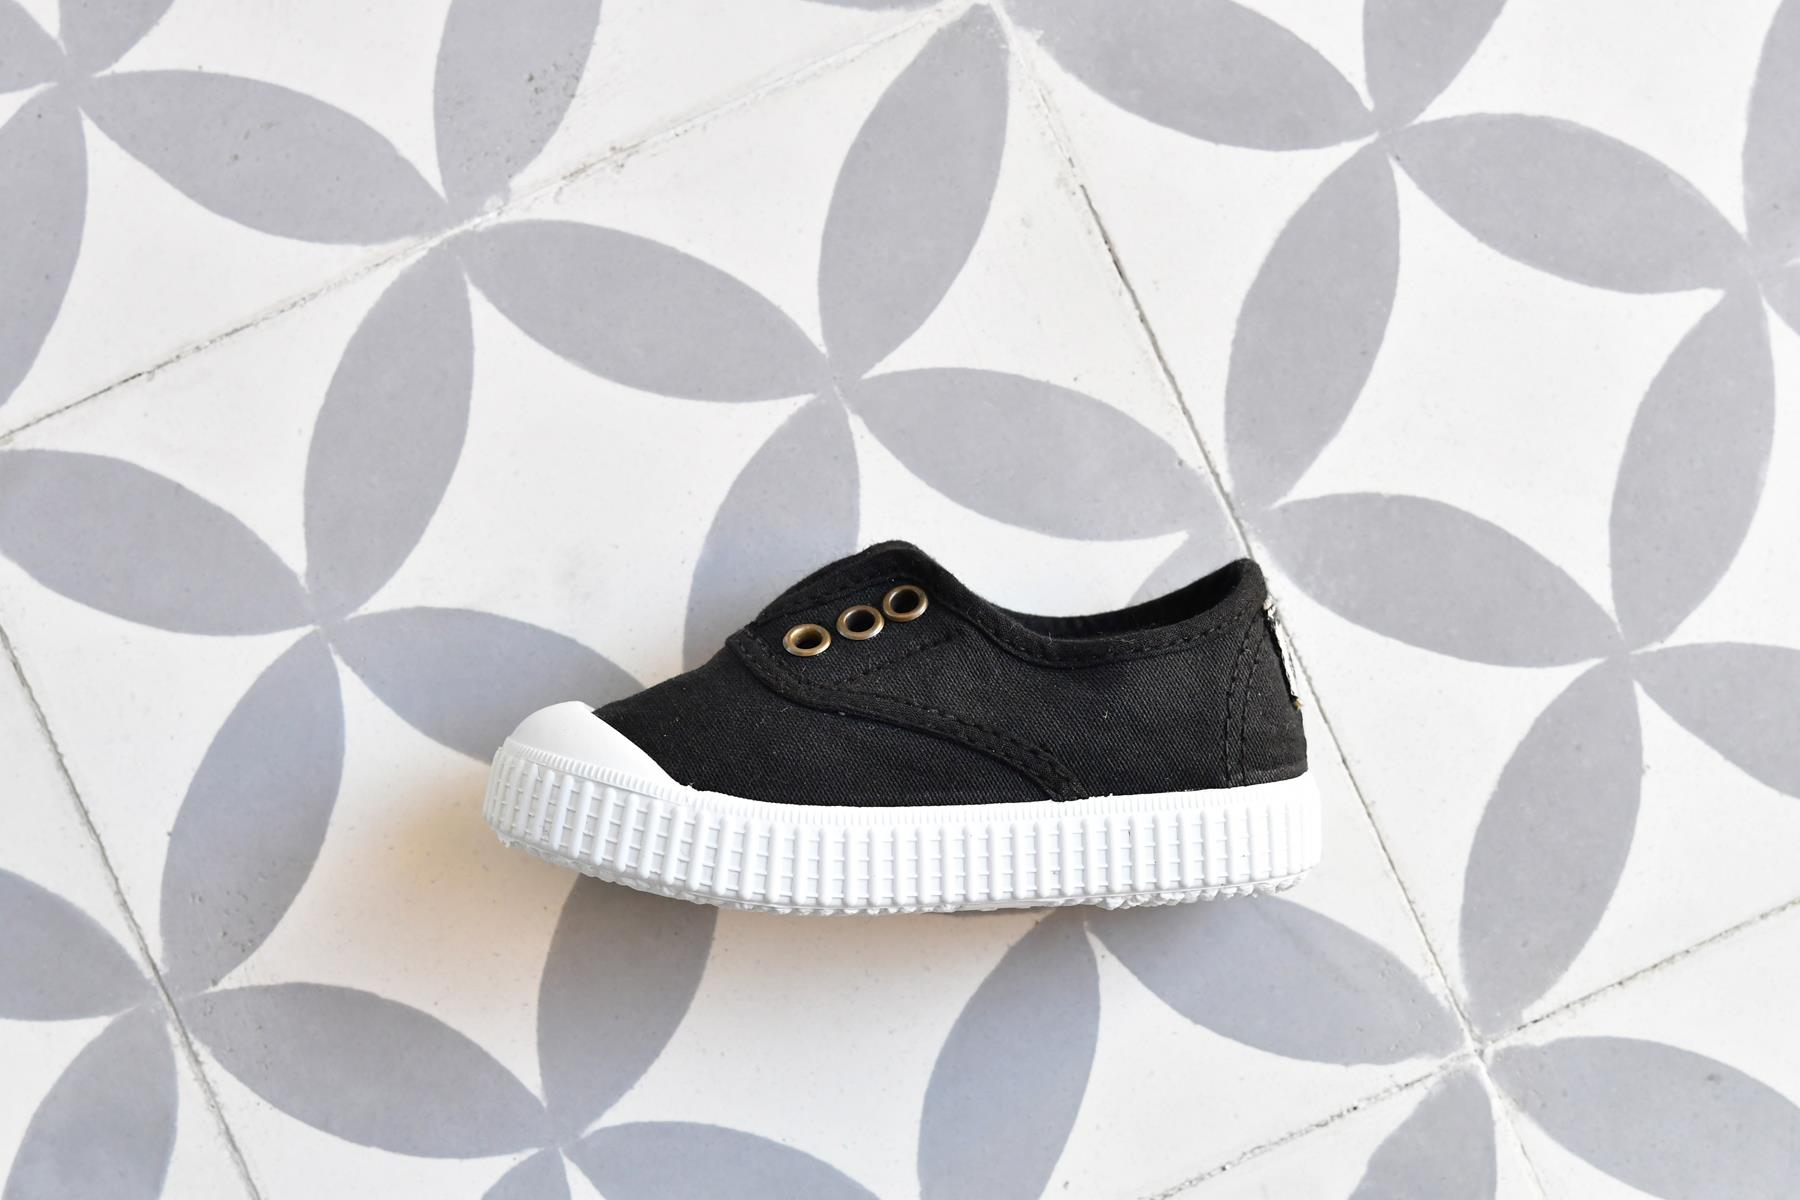 Zapatilla Inglesa Victoria 6627 Negro AmorShoes